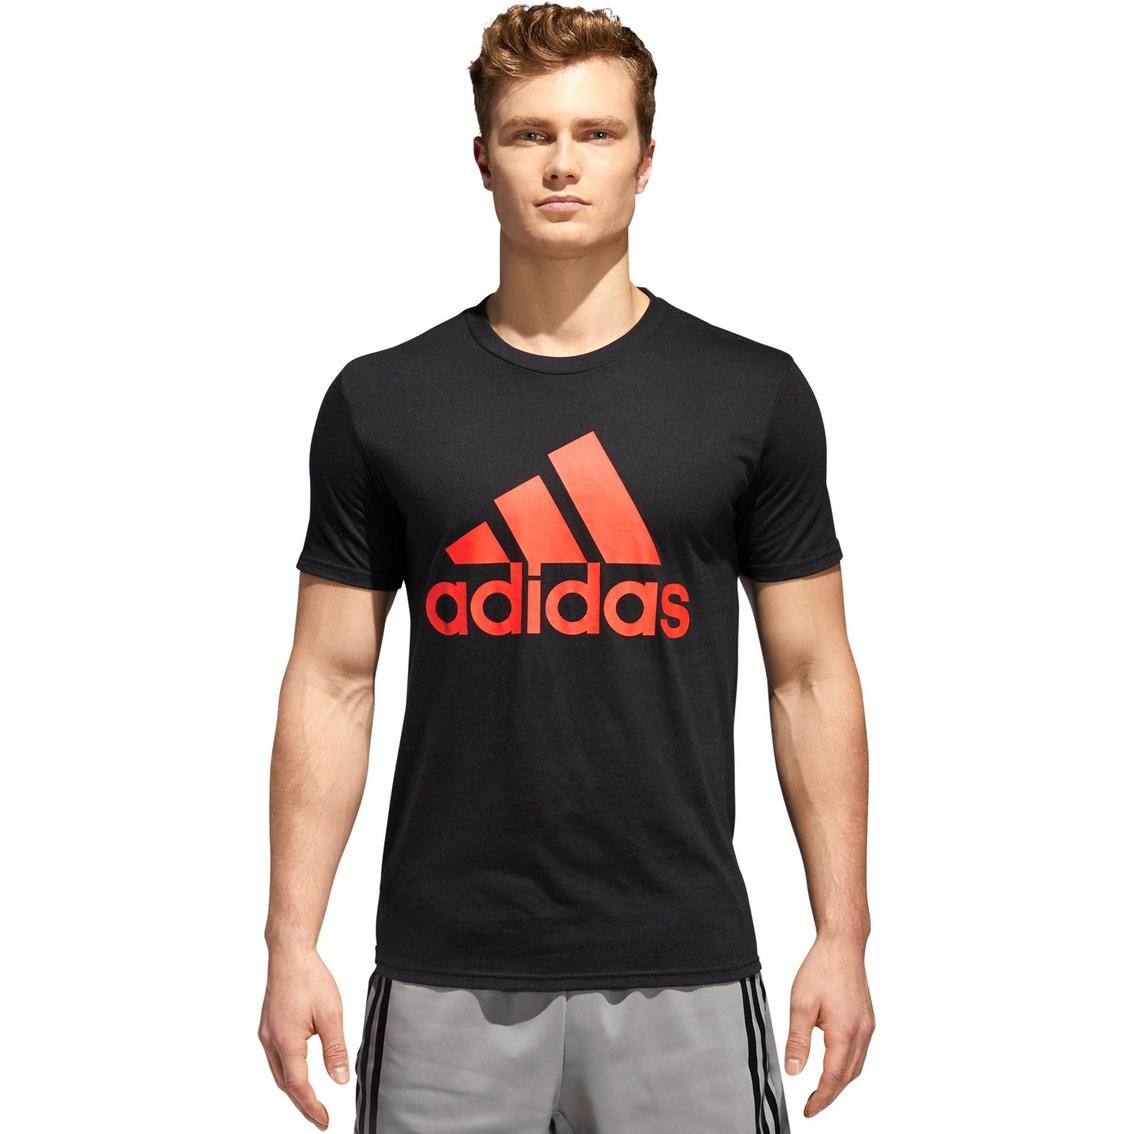 Adidas Badge Of Sport Classic Tee   Shirts   Apparel   Shop